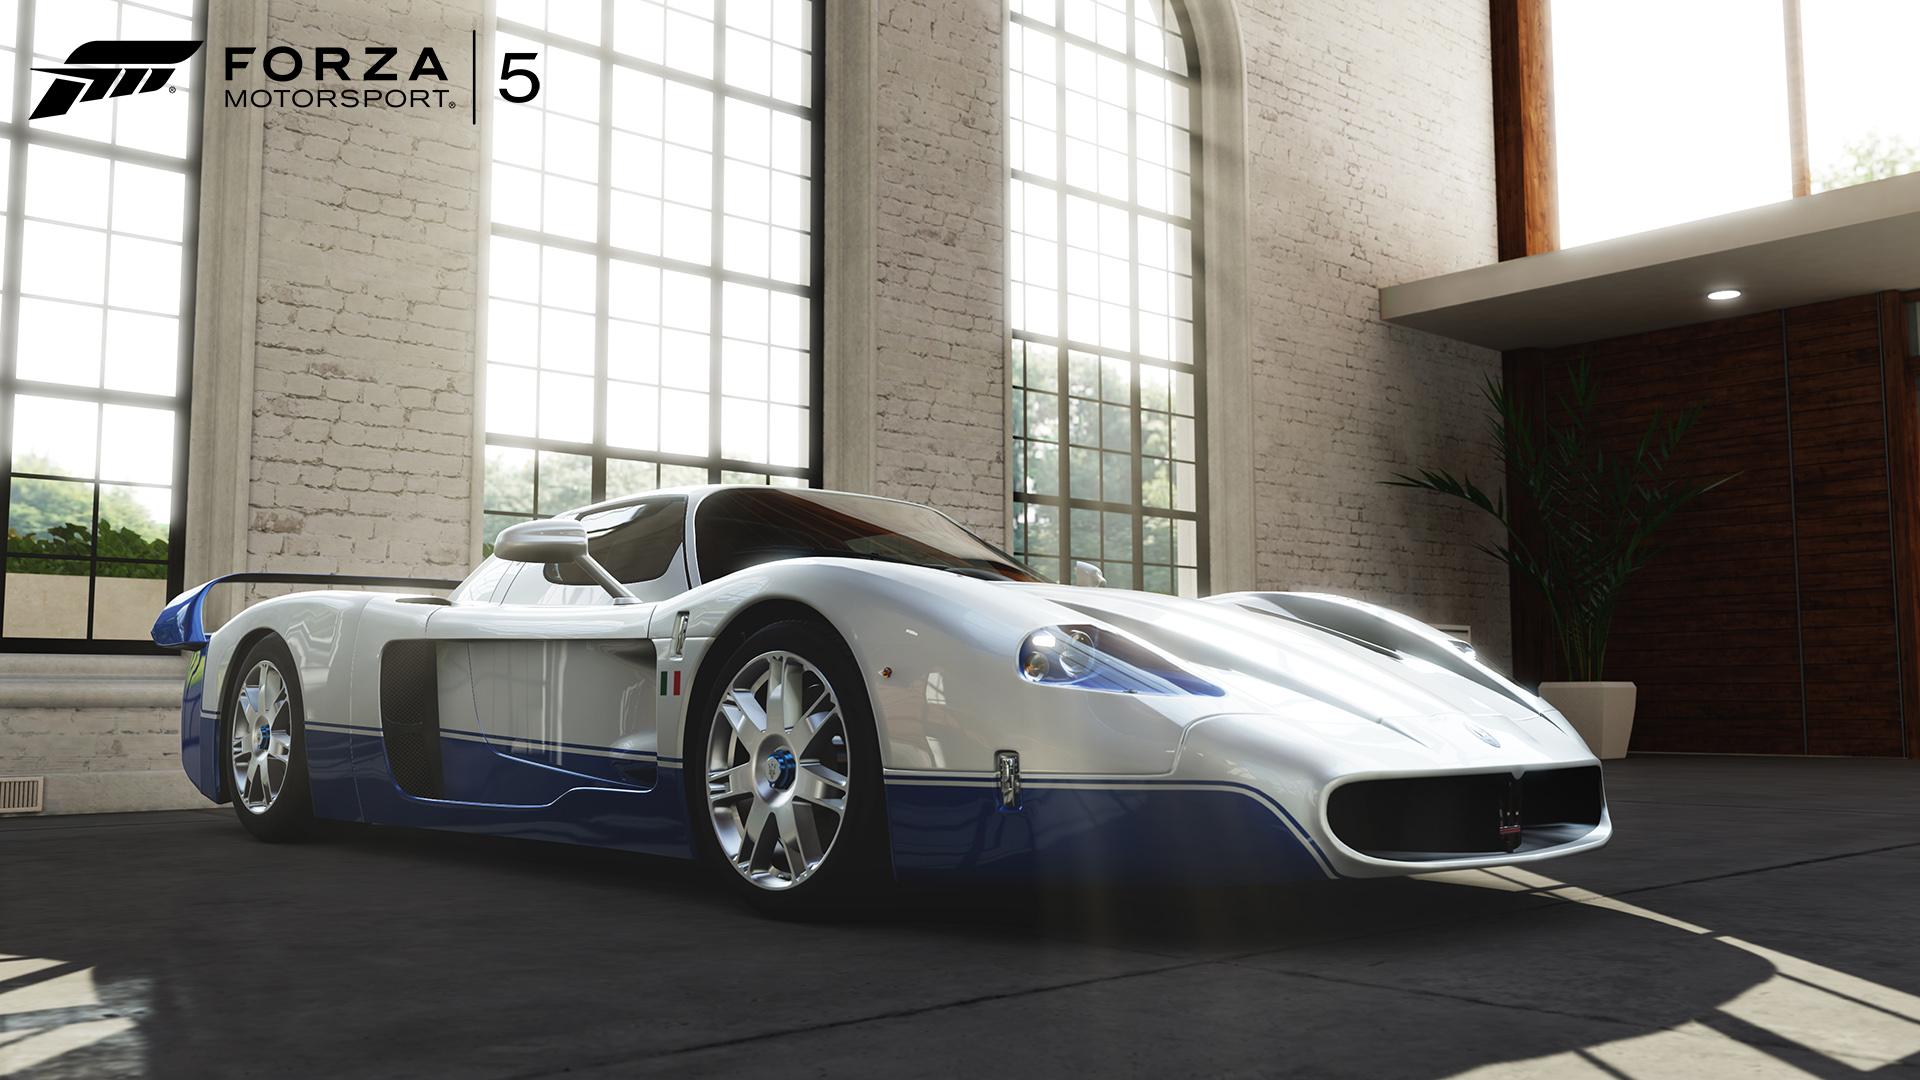 https://vignette.wikia.nocookie.net/forzamotorsport/images/c/c3/FM5_Maserati_MC12.jpg/revision/latest?cb=20170903213739